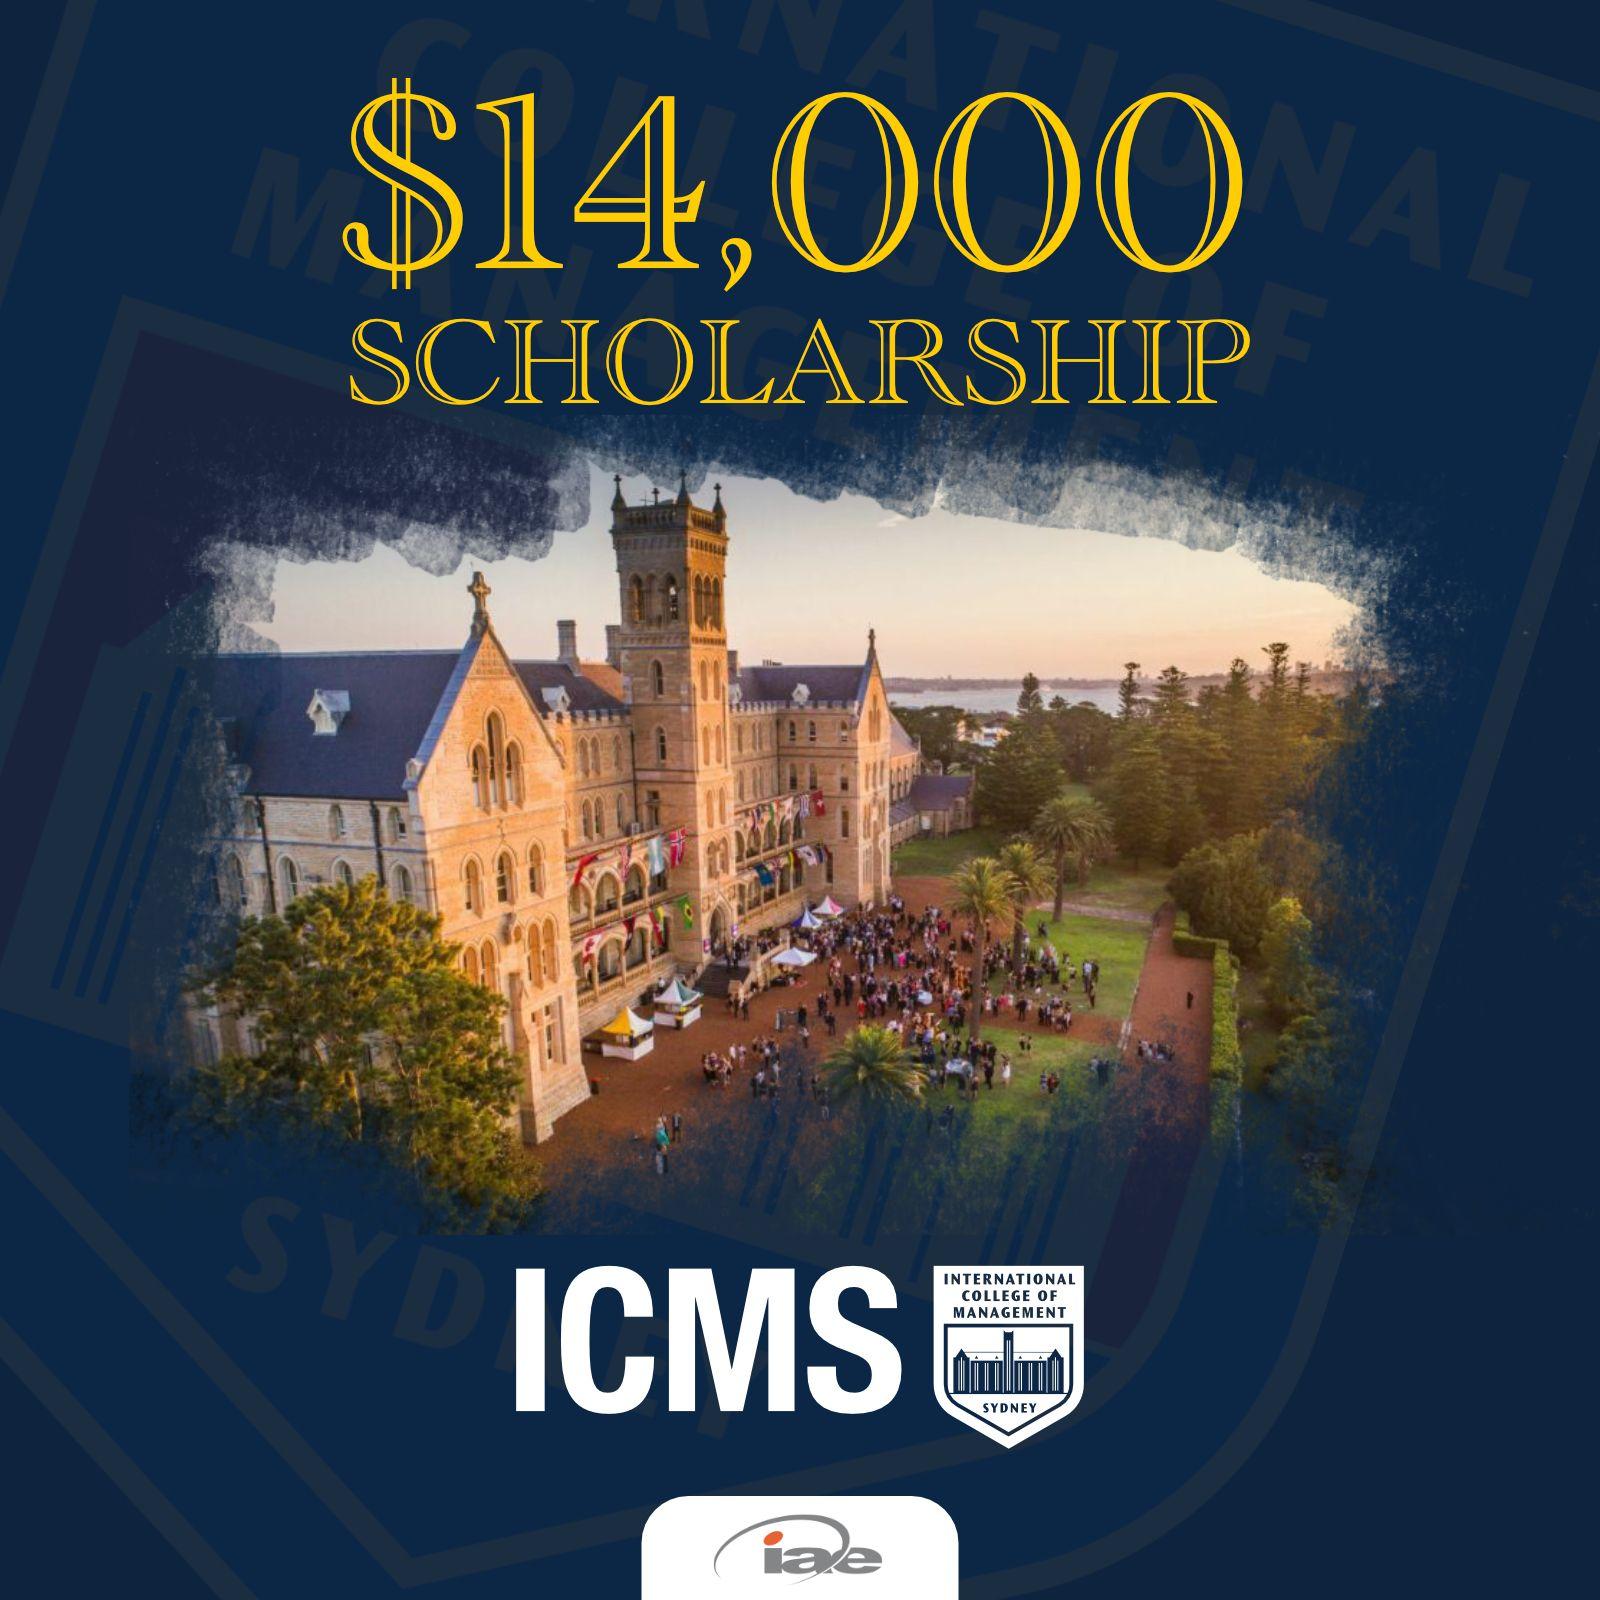 ICMS_14000_scholarship